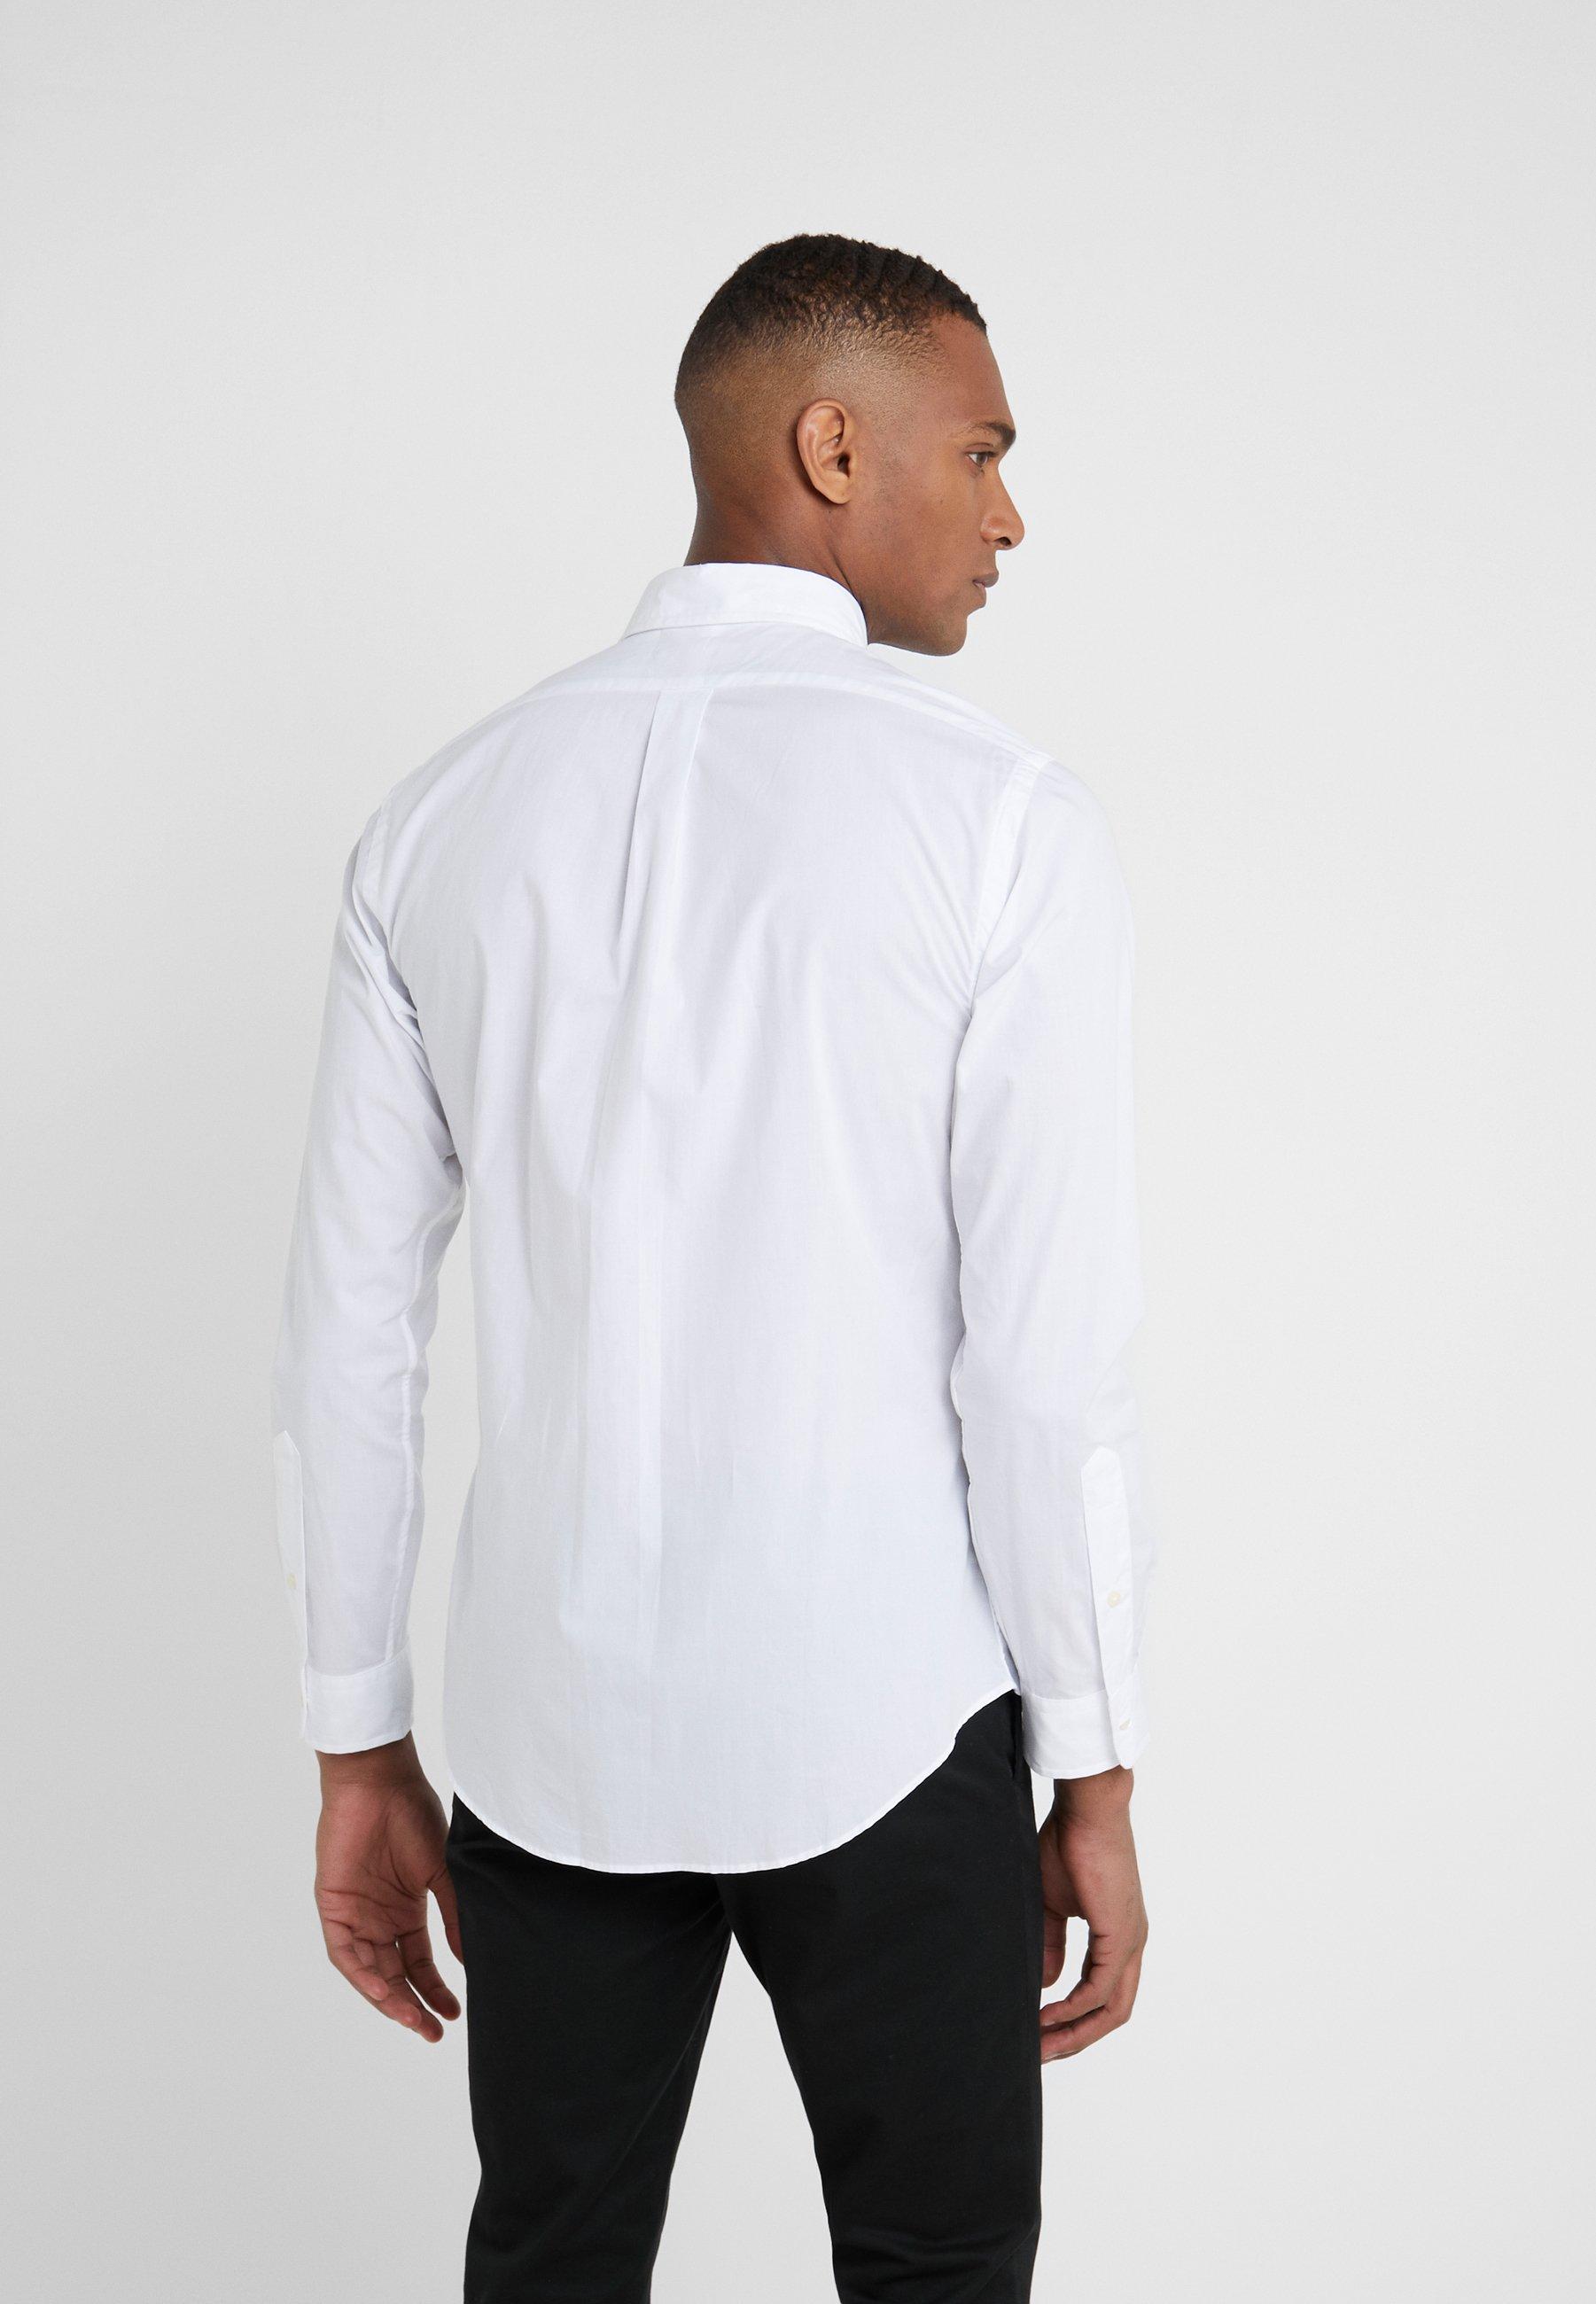 Polo Ralph Lauren NATURAL SLIM FIT - Shirt - white